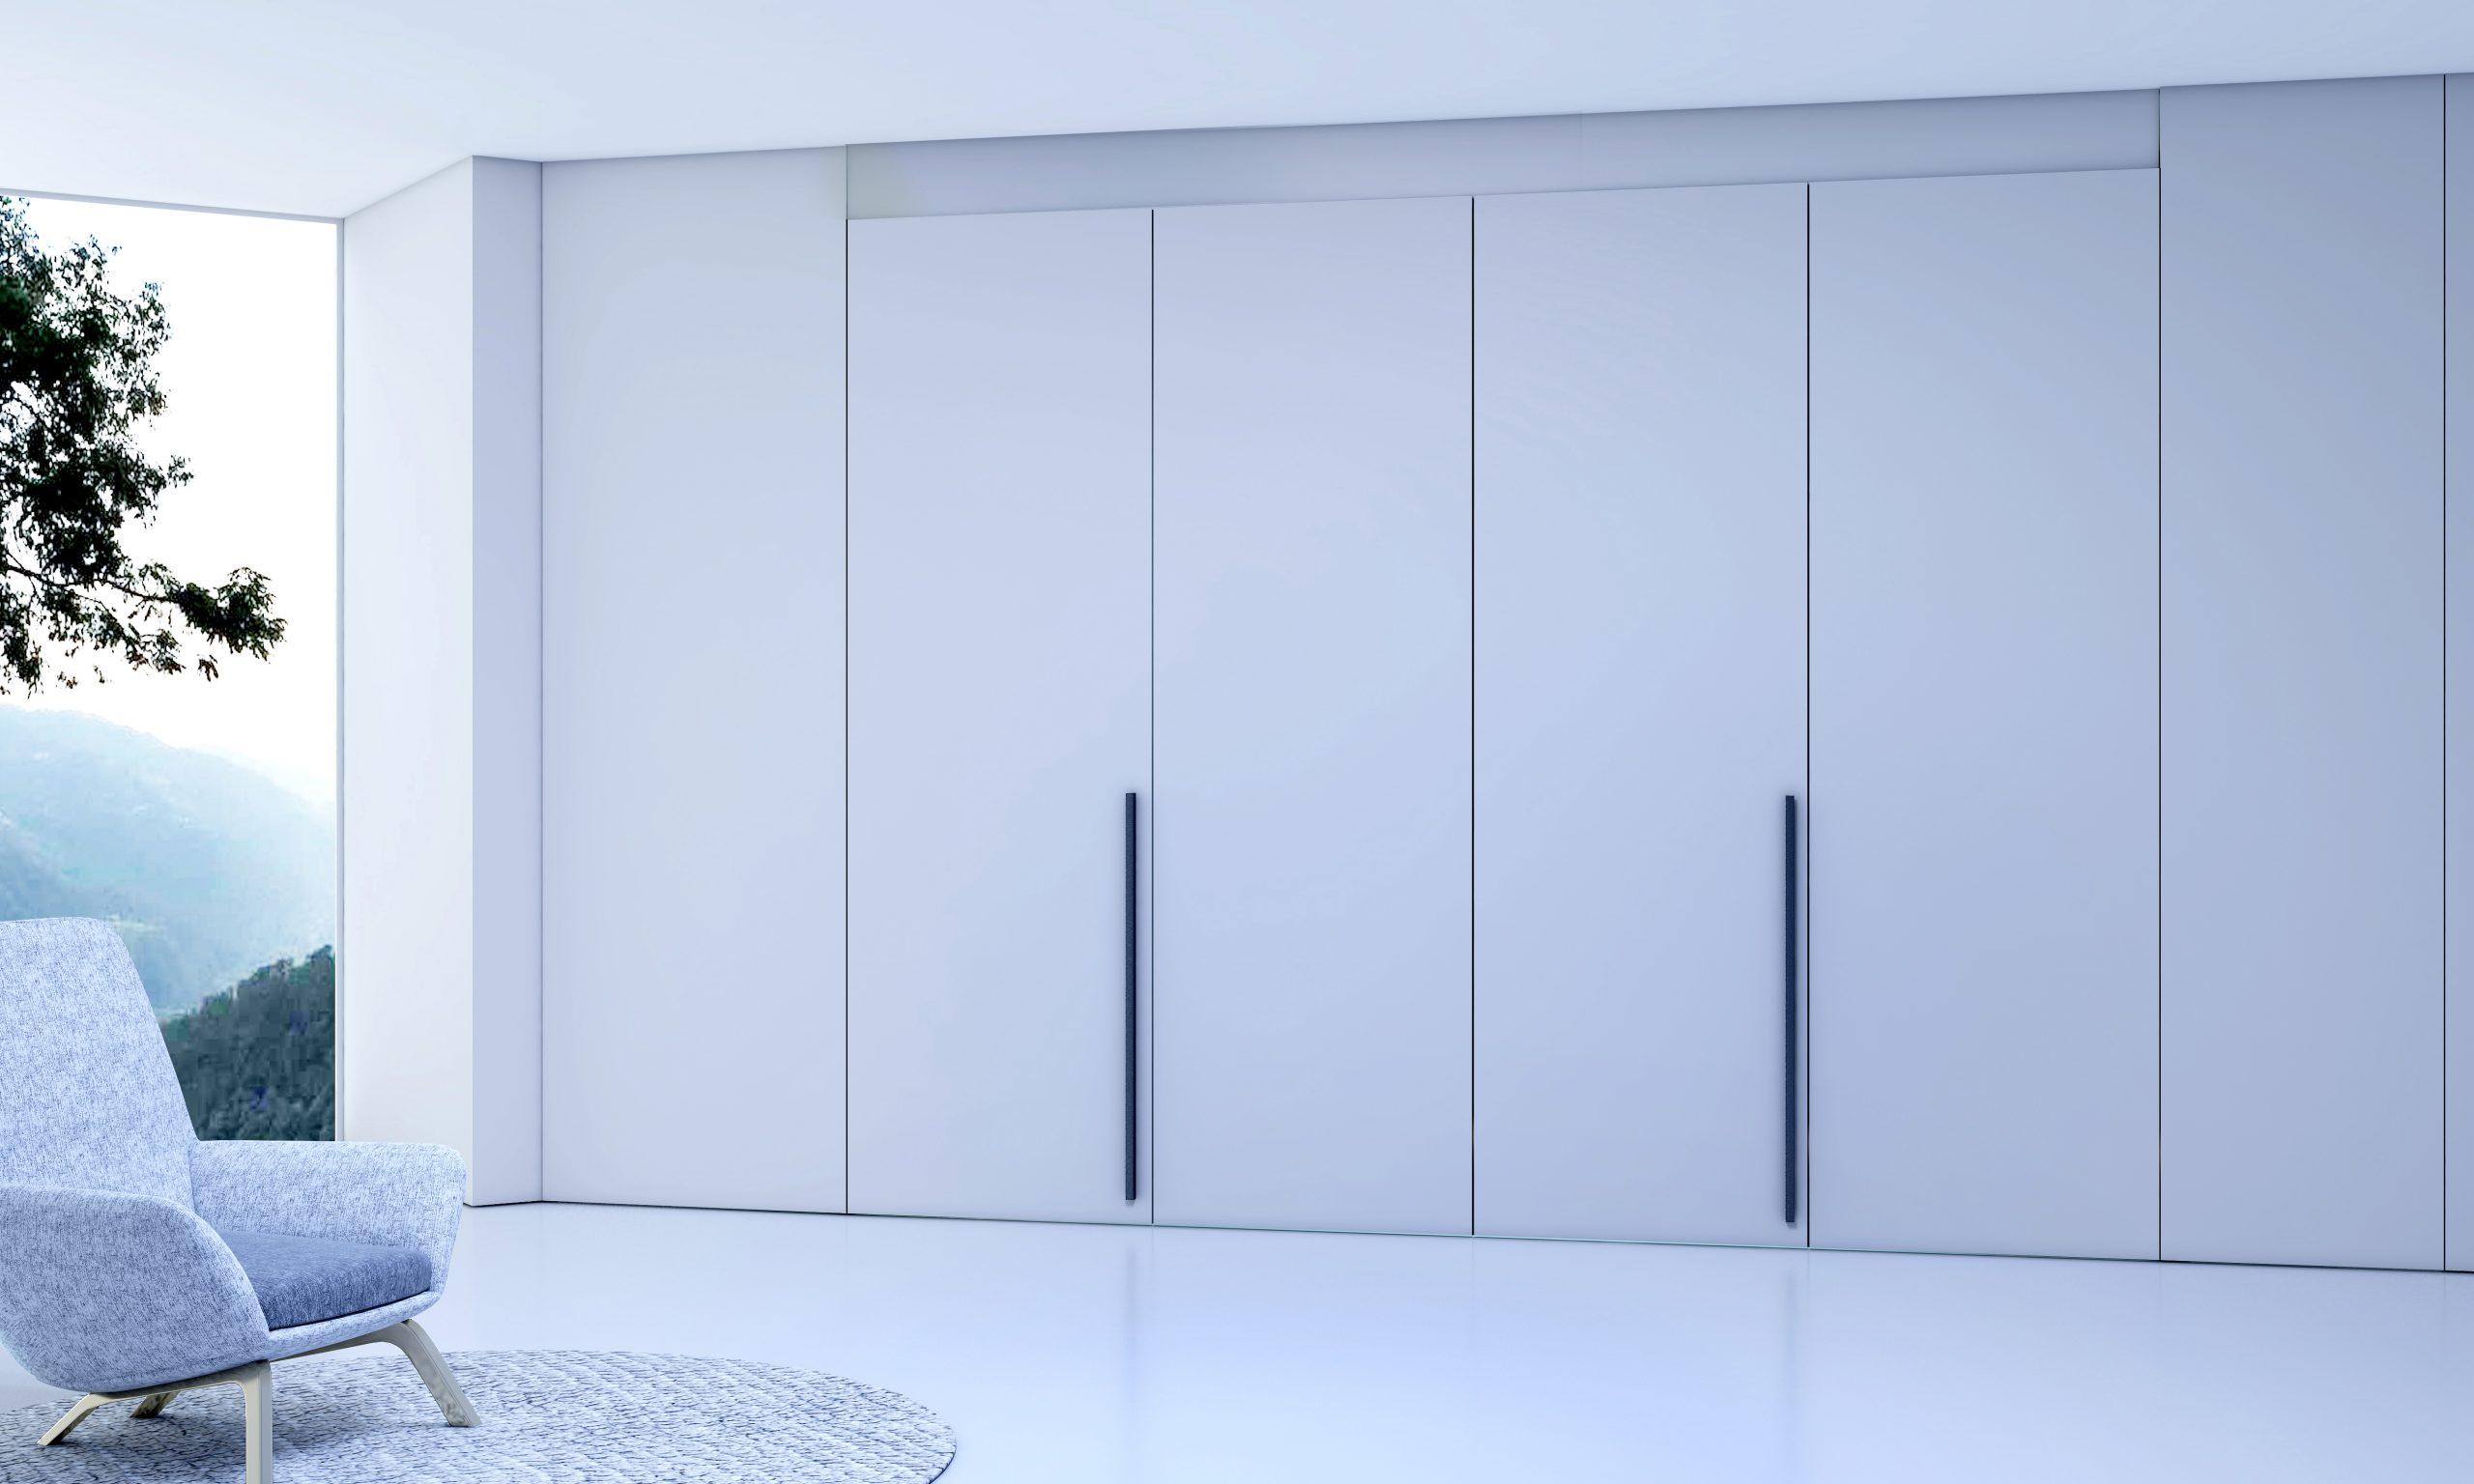 Bifold Walk-in Wardrobe in Stone Grey Finish With Long Handles